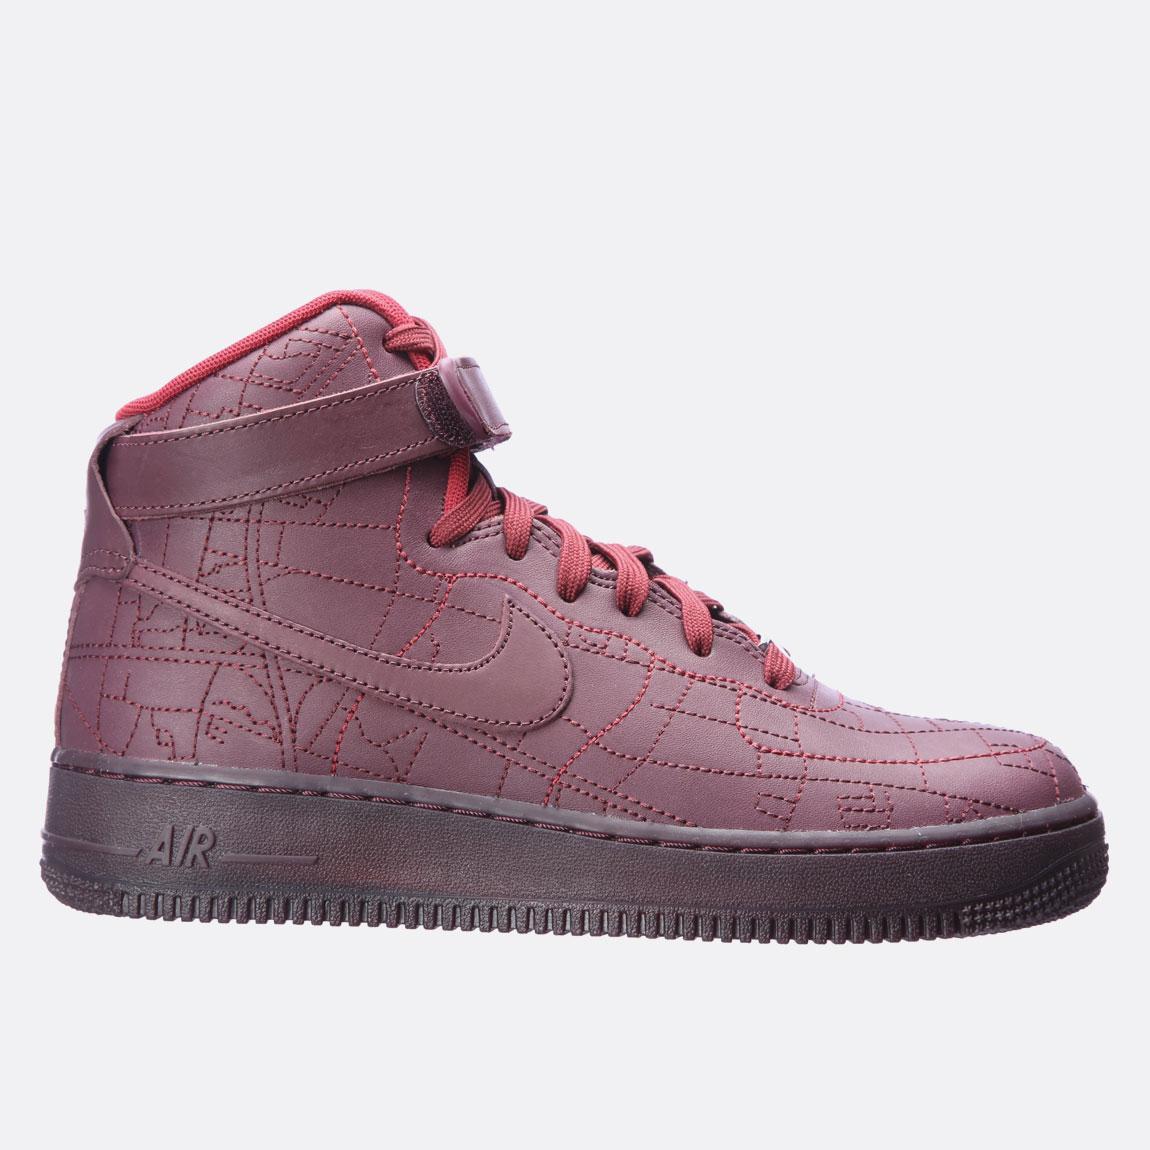 huge discount 4ccb6 160fe Air Force 1 High FW QS - Deep Burgandy Deep Burgandy Nike Sneakers    Superbalist.com